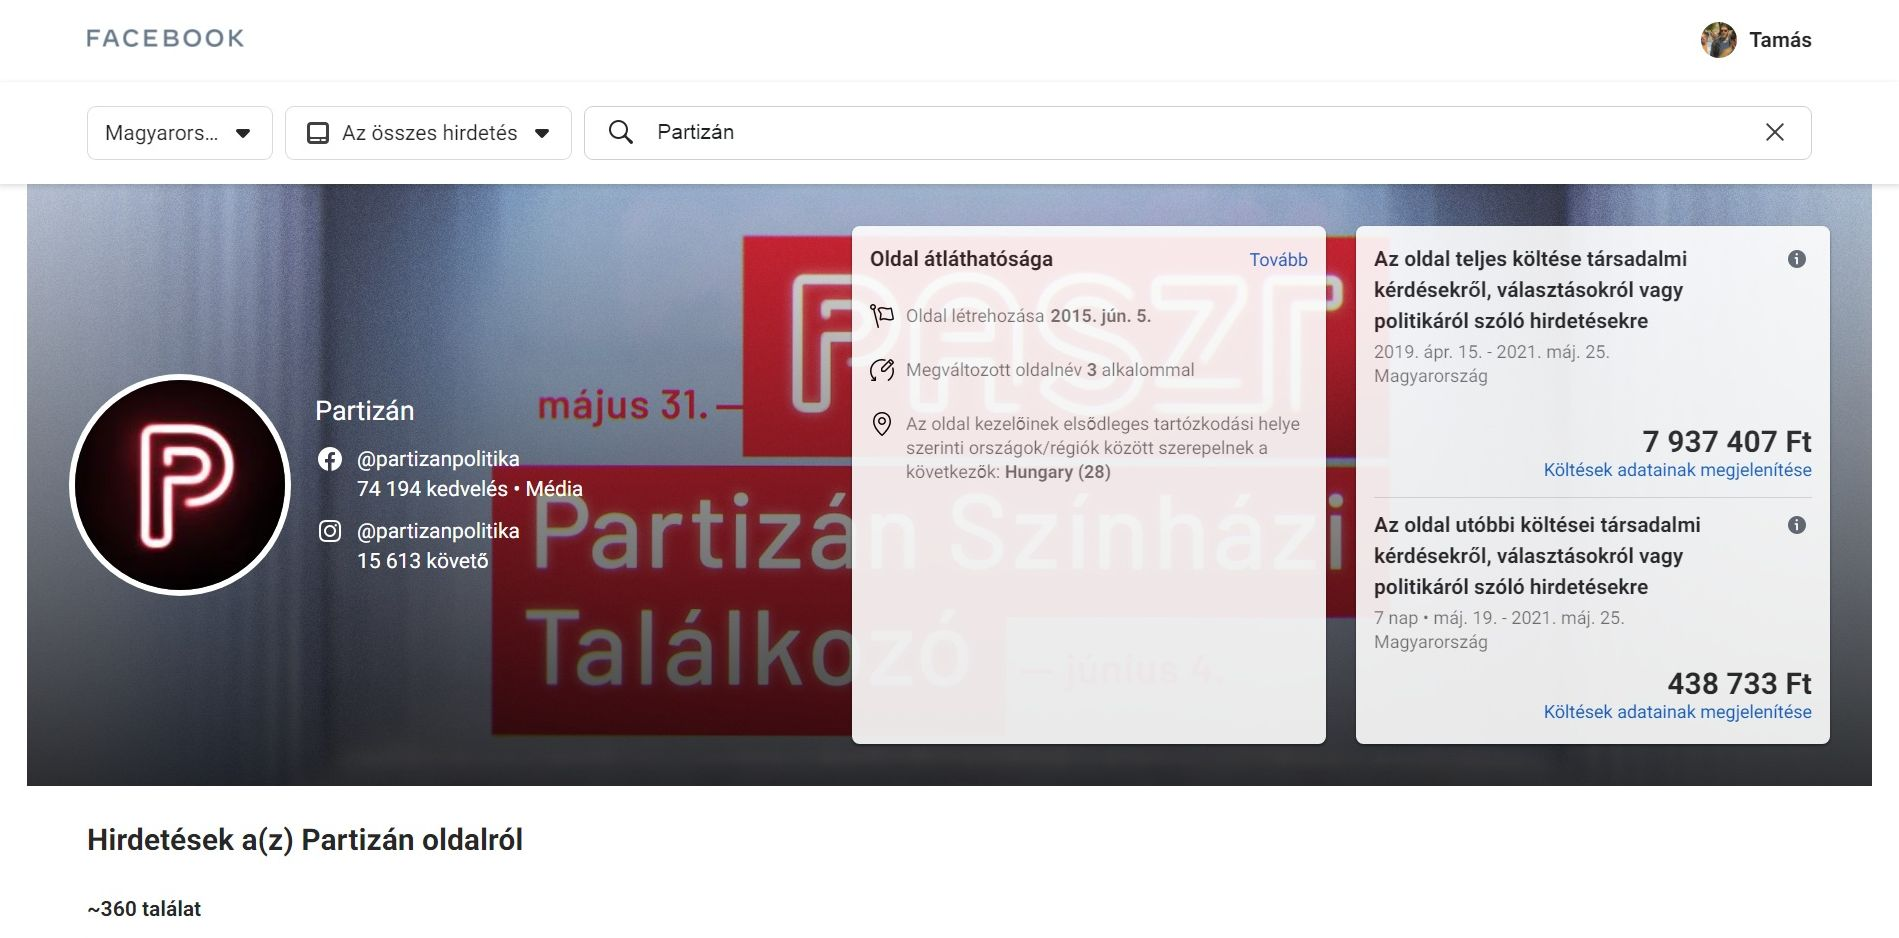 partizan_koltesek.jpg